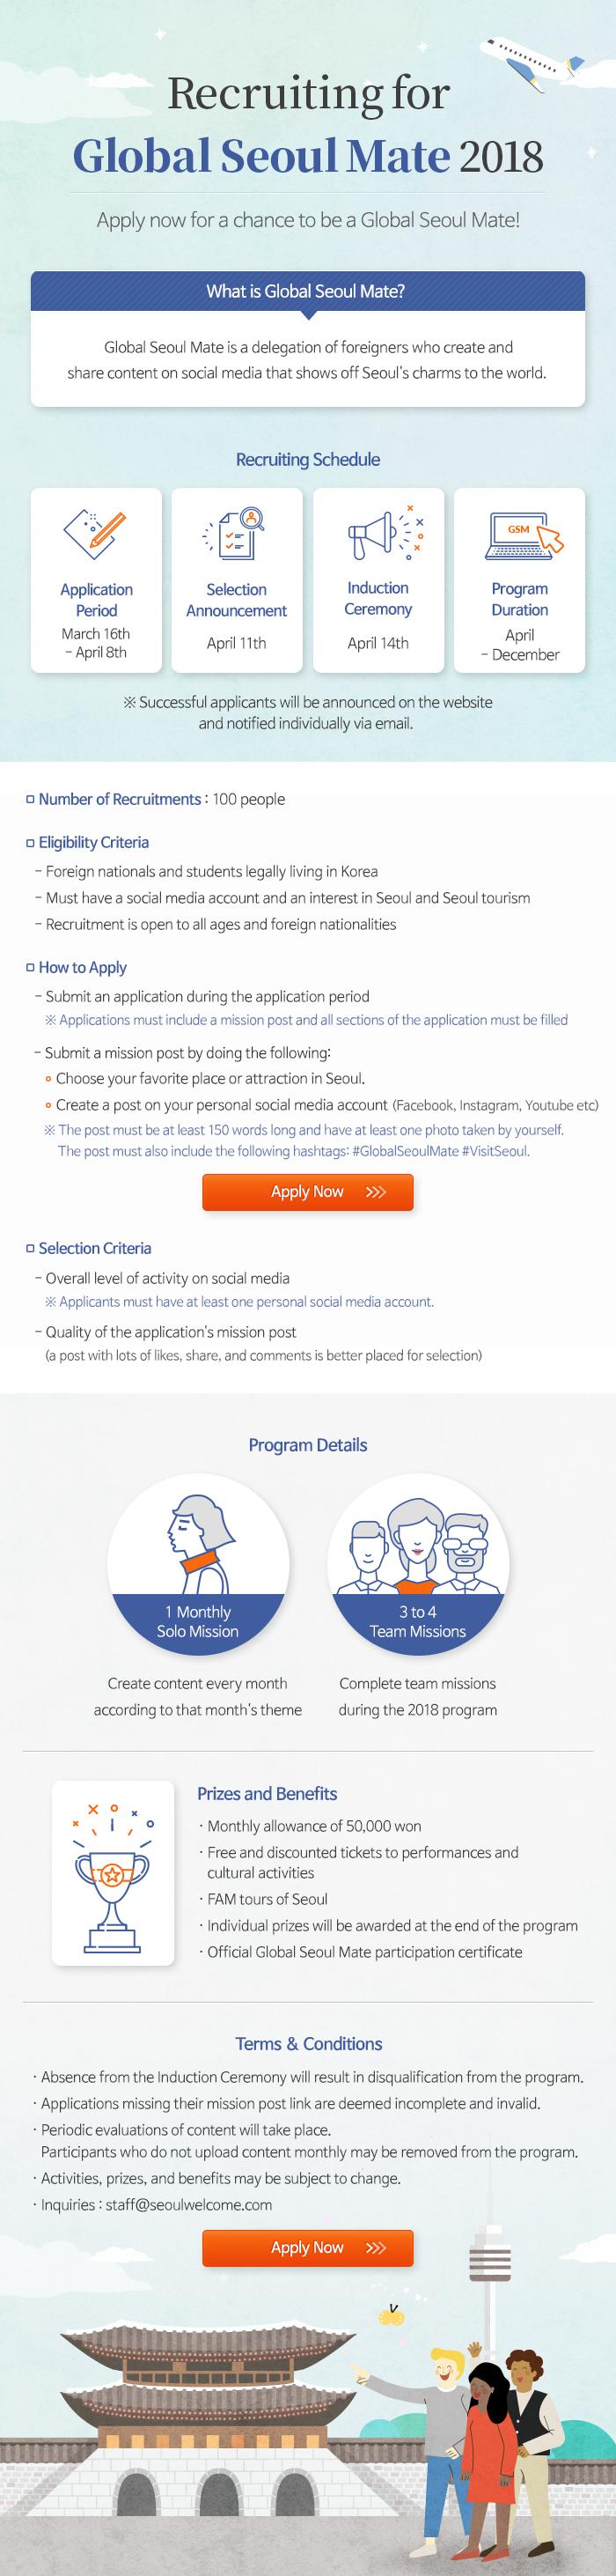 2018_GSM_recruiting_en